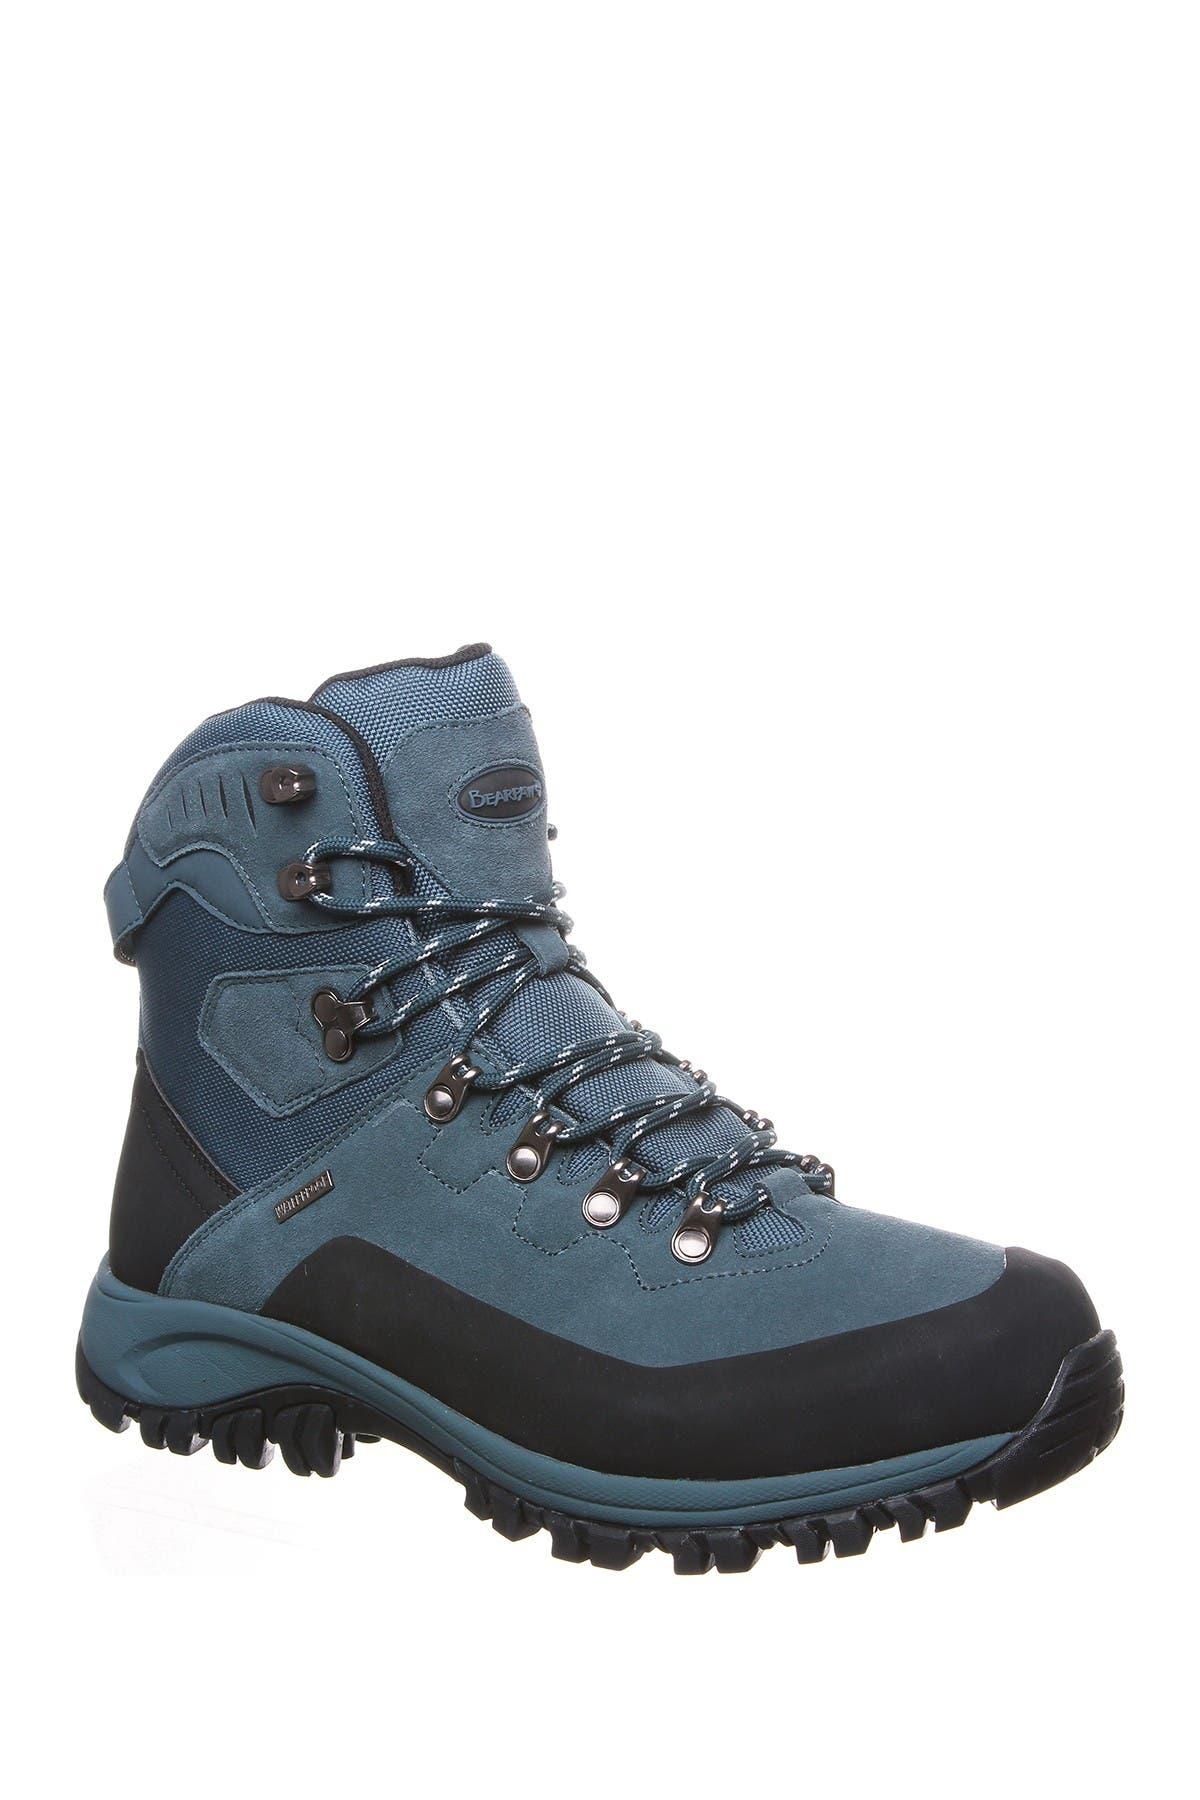 Image of BEARPAW Traverse Waterproof Hiking Boot